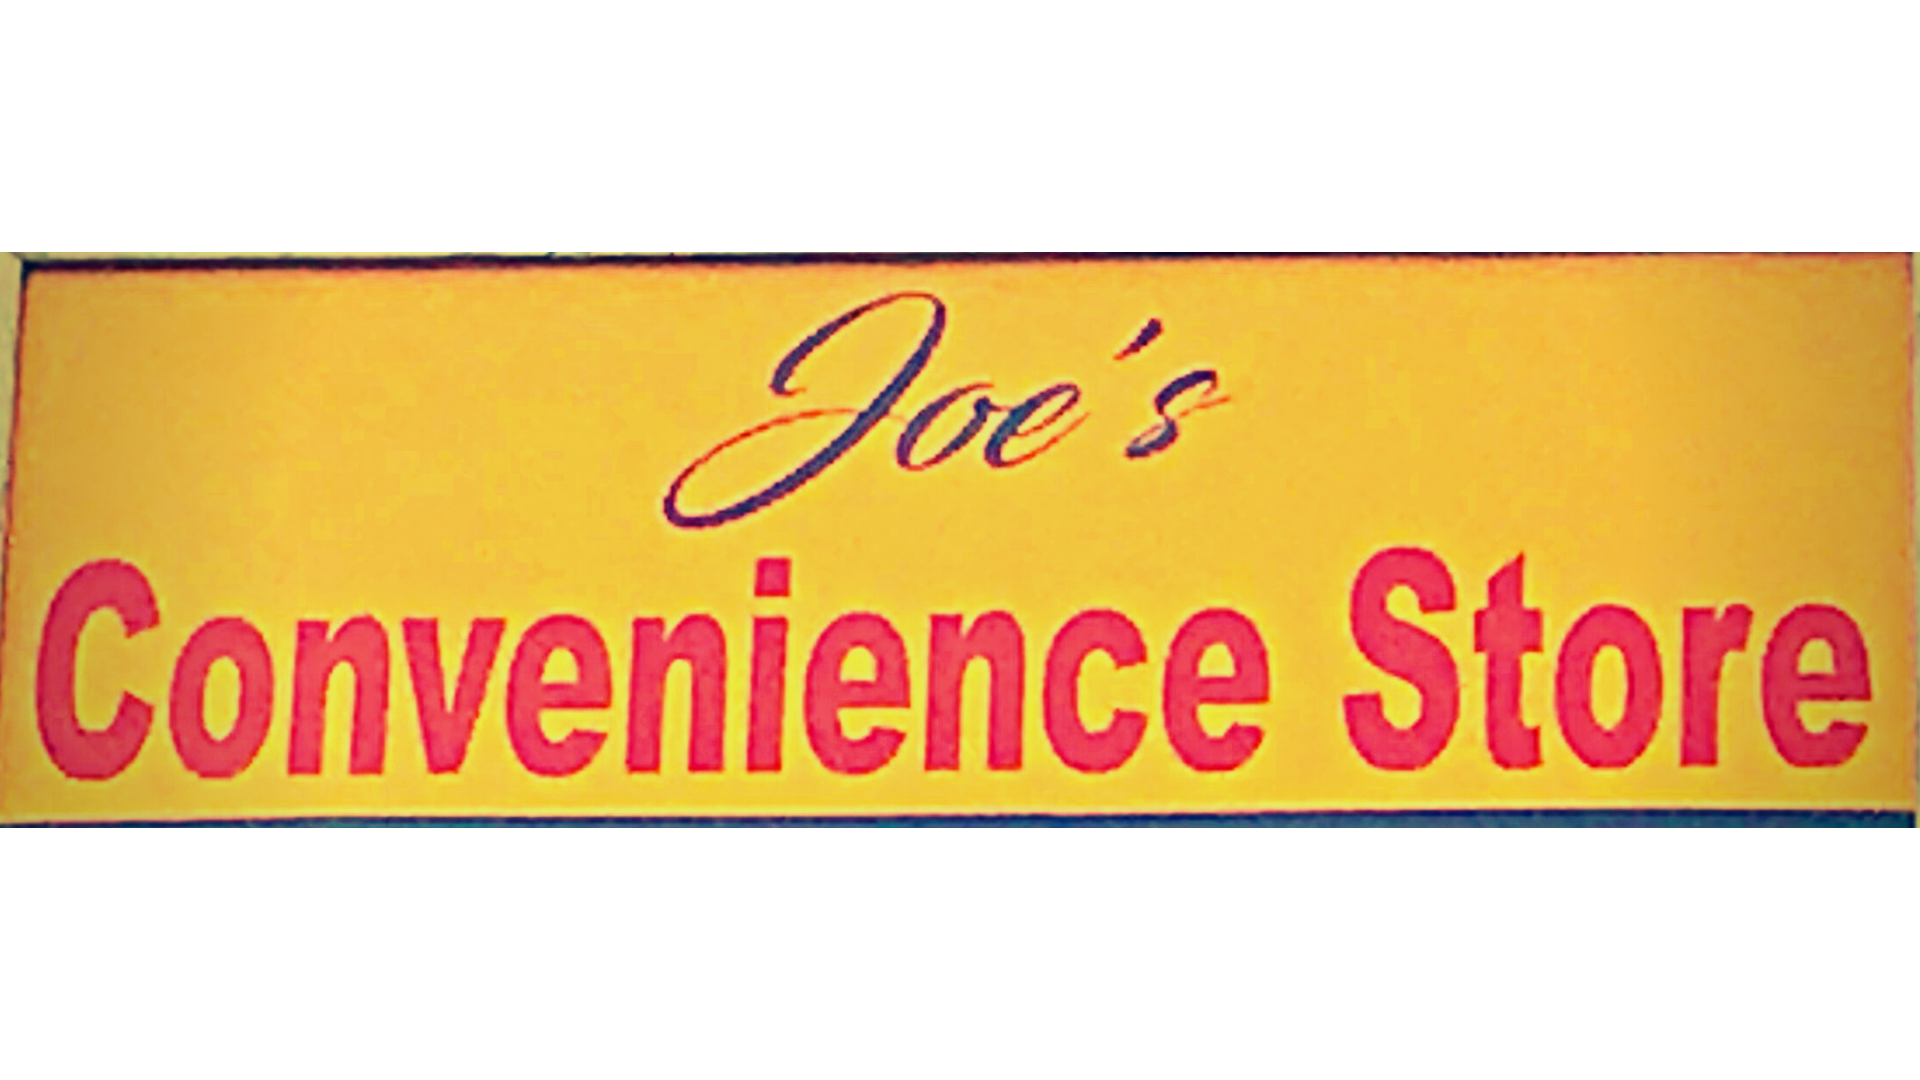 Joe's Convenience Store